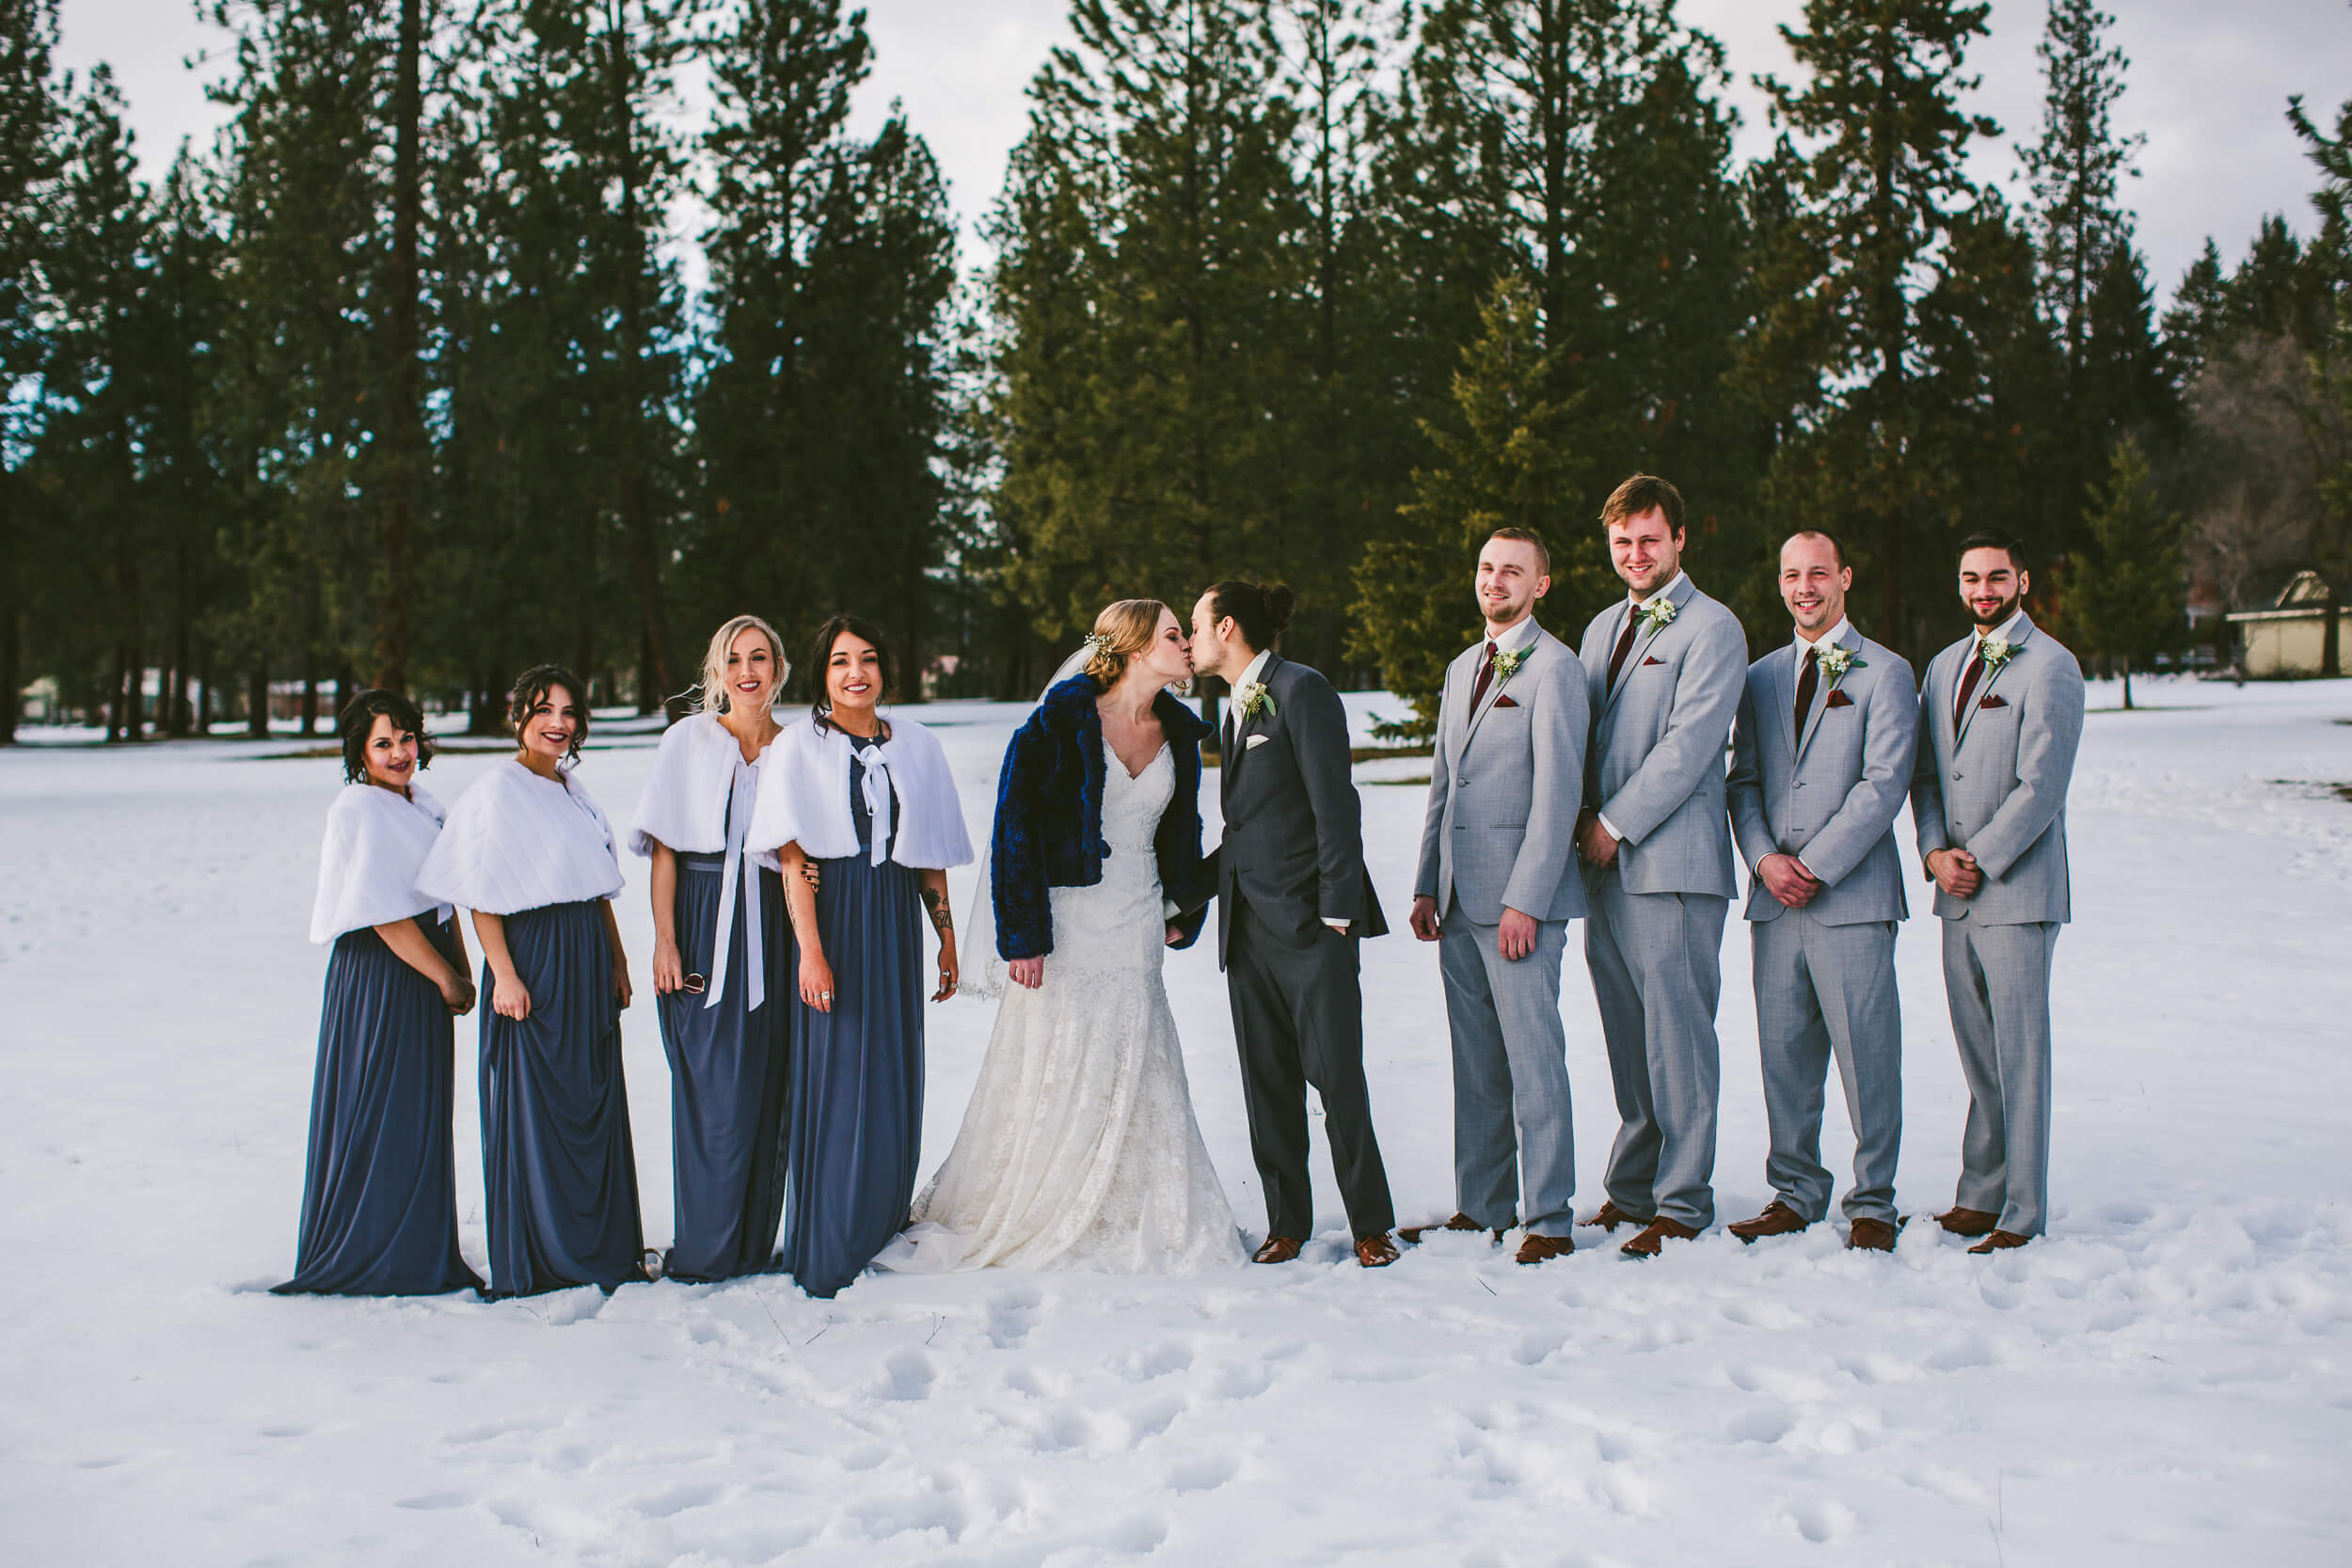 mukogawa winter wedding in spokane (99).jpg